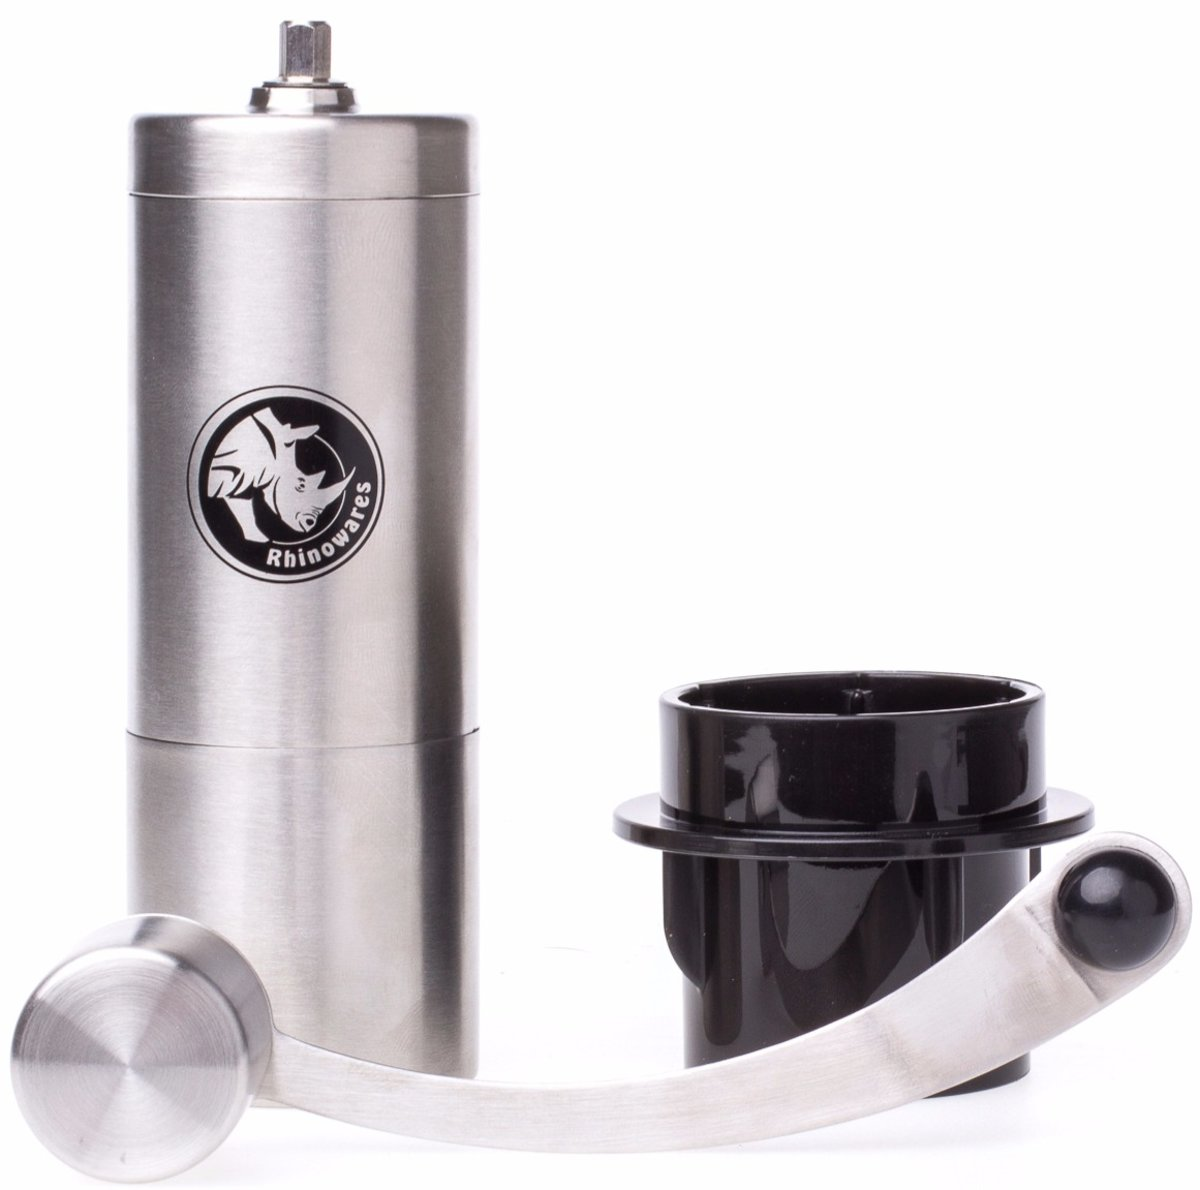 Rhino Compact Coffee Hand Grinder kopen